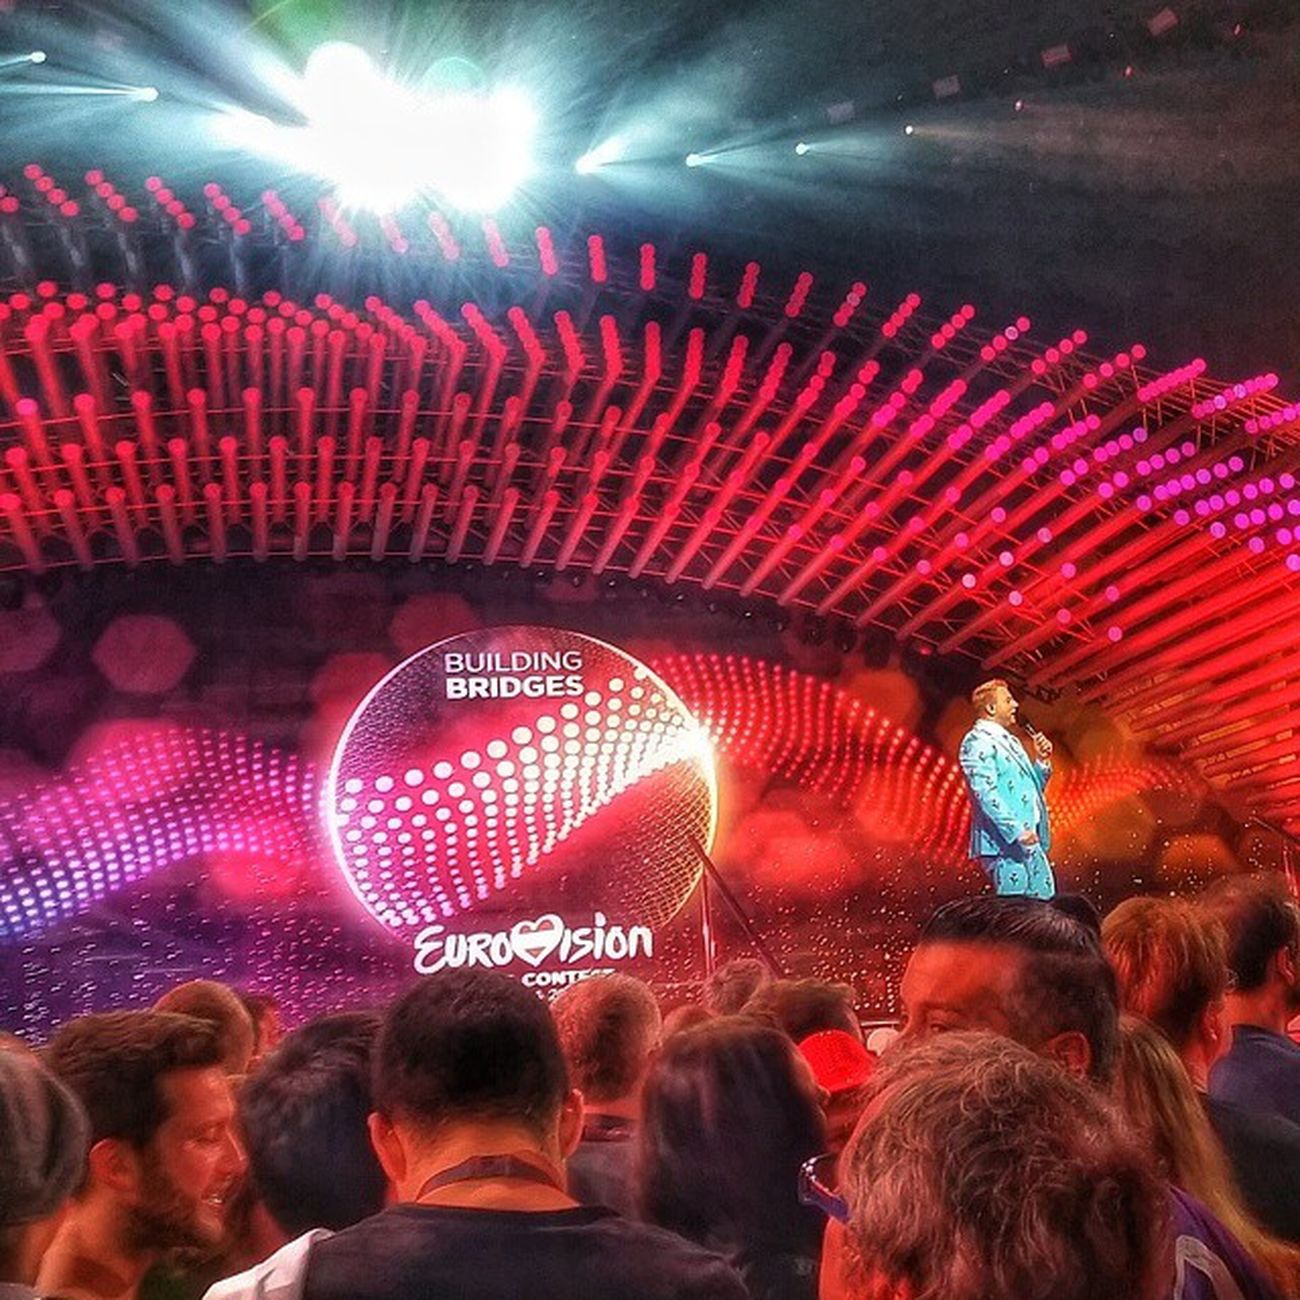 Eurovision2015 GreatNight  Goireland